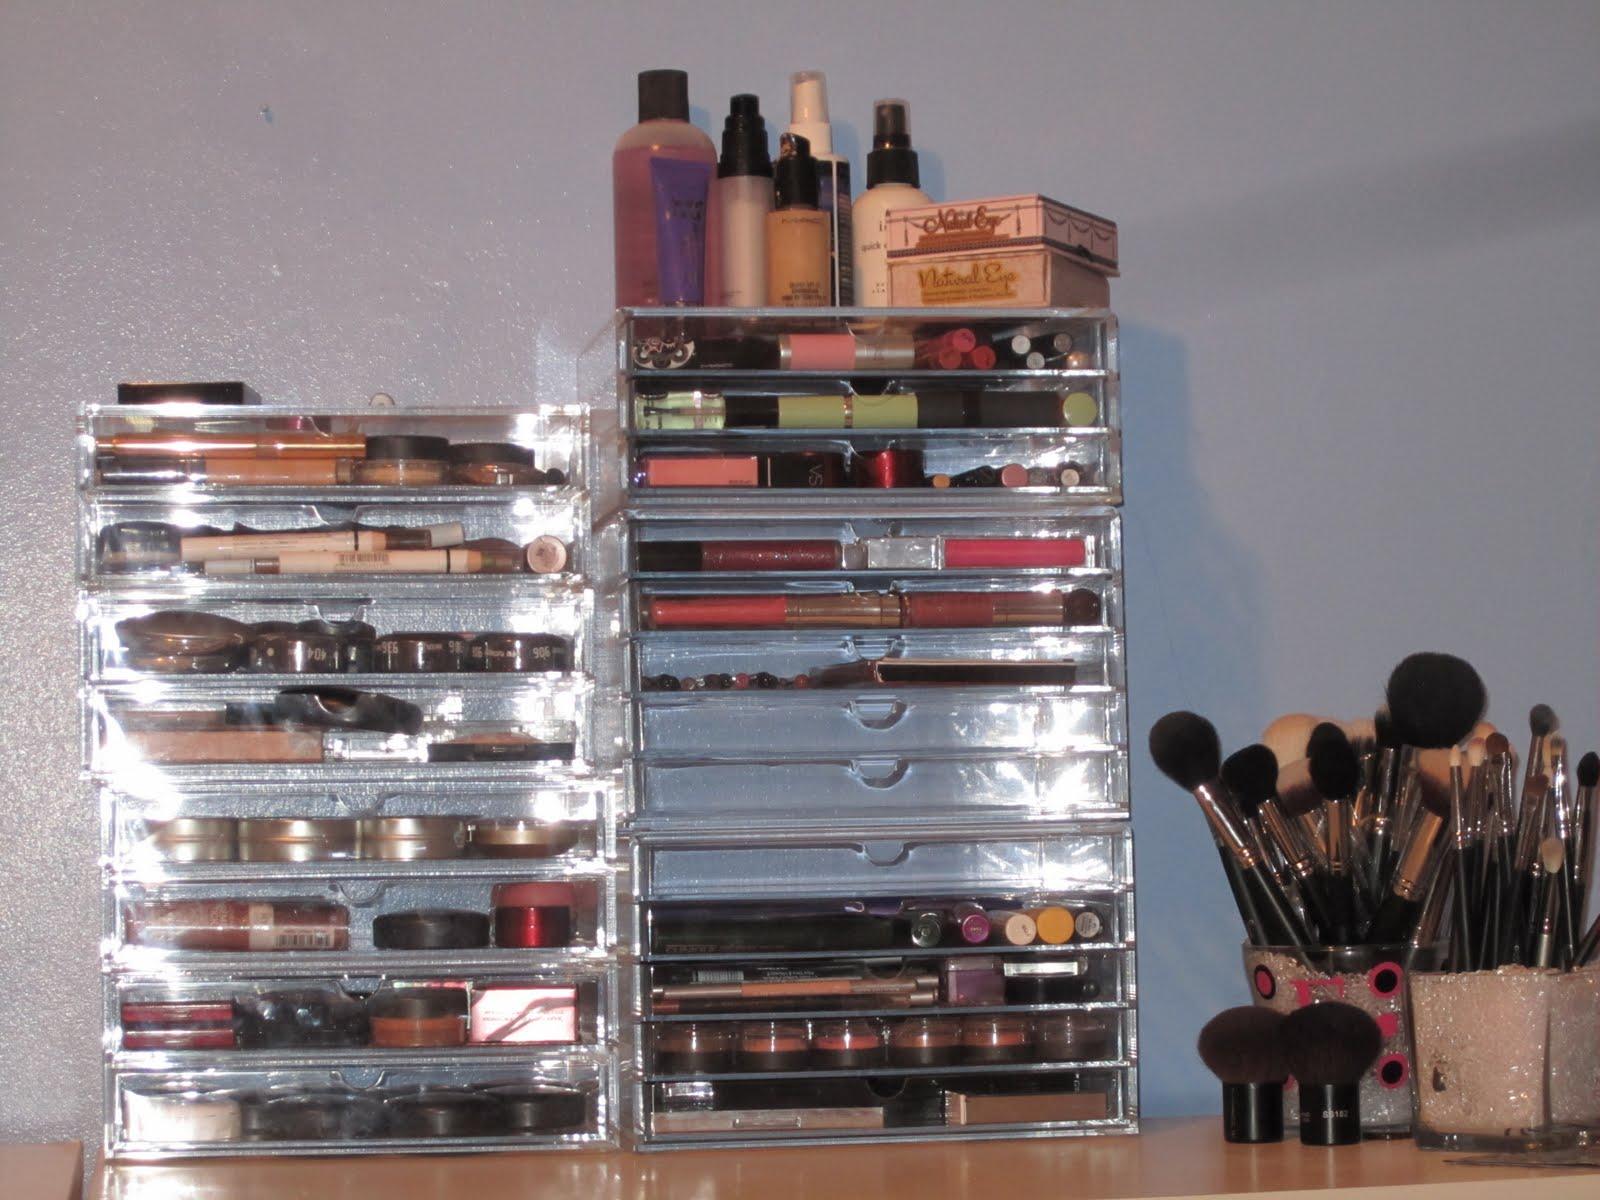 Emoney429 Muji Acrylic Makeup Storage The Clear Cube Dupe & Acrylic Makeup Storage Muji - Listitdallas